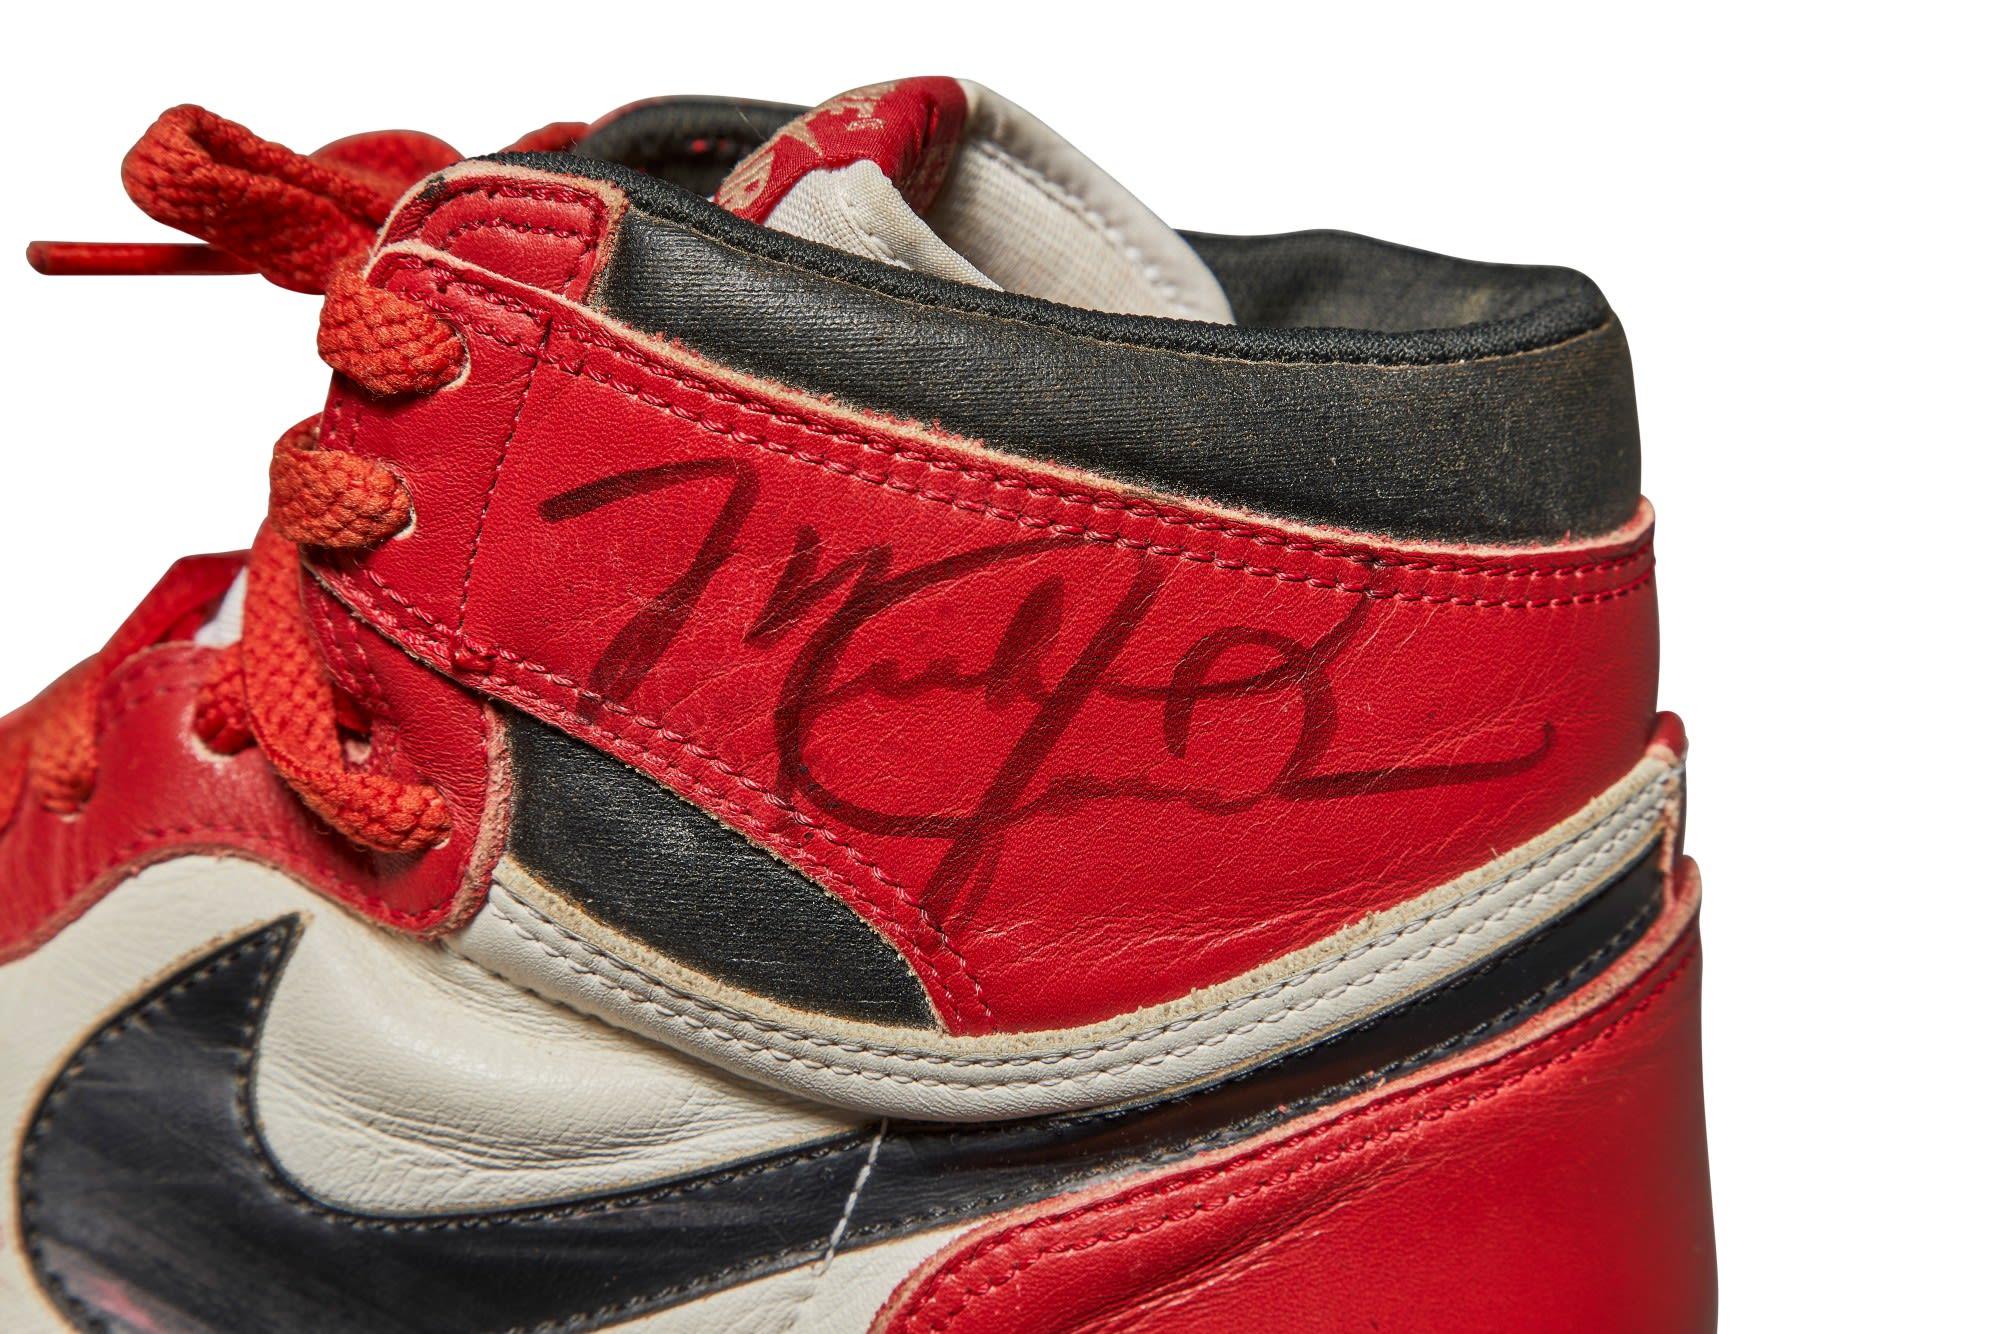 Michael Jordan Game Worn Autographed 1985 Air Jordan 1 High 'Chicago'